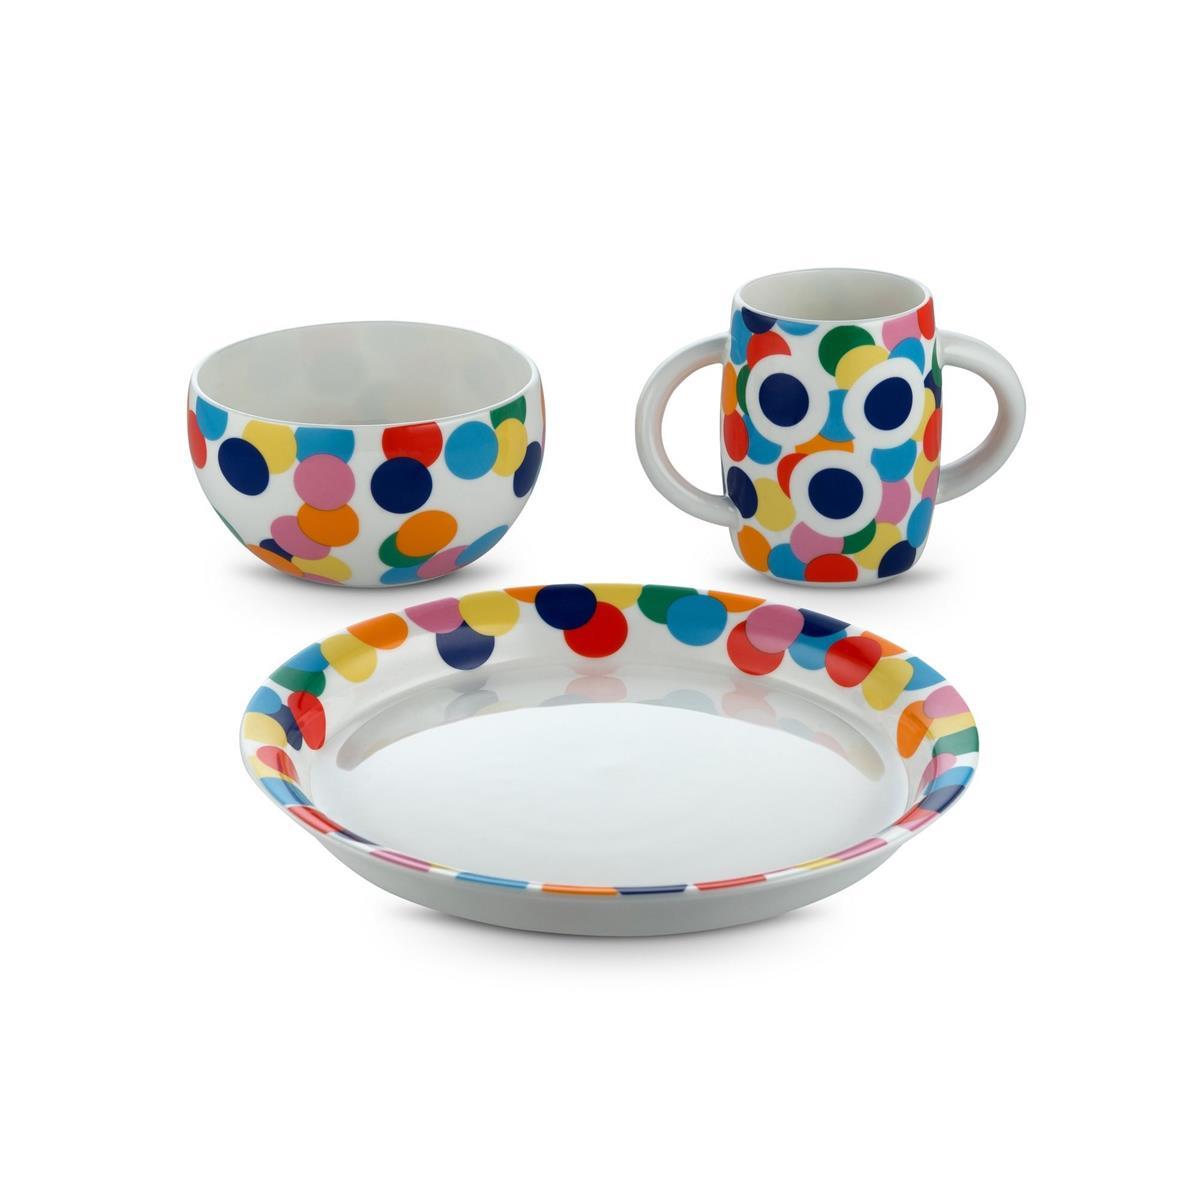 Alessi-Alessini-Proust Table set for children in fine bone china